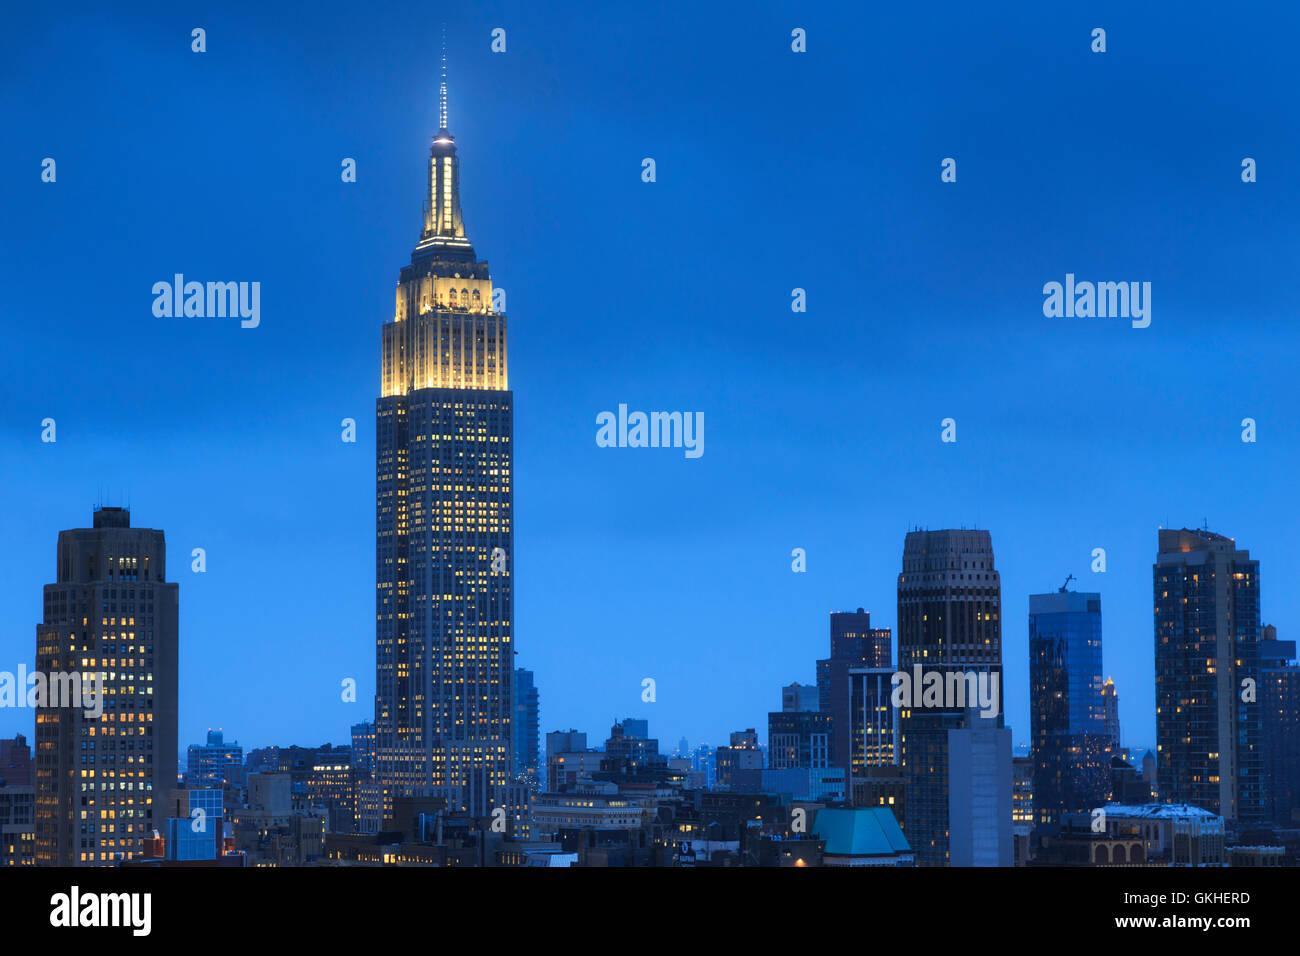 USA, New York, New York City, Manhattan, Empire State Building Stock Photo